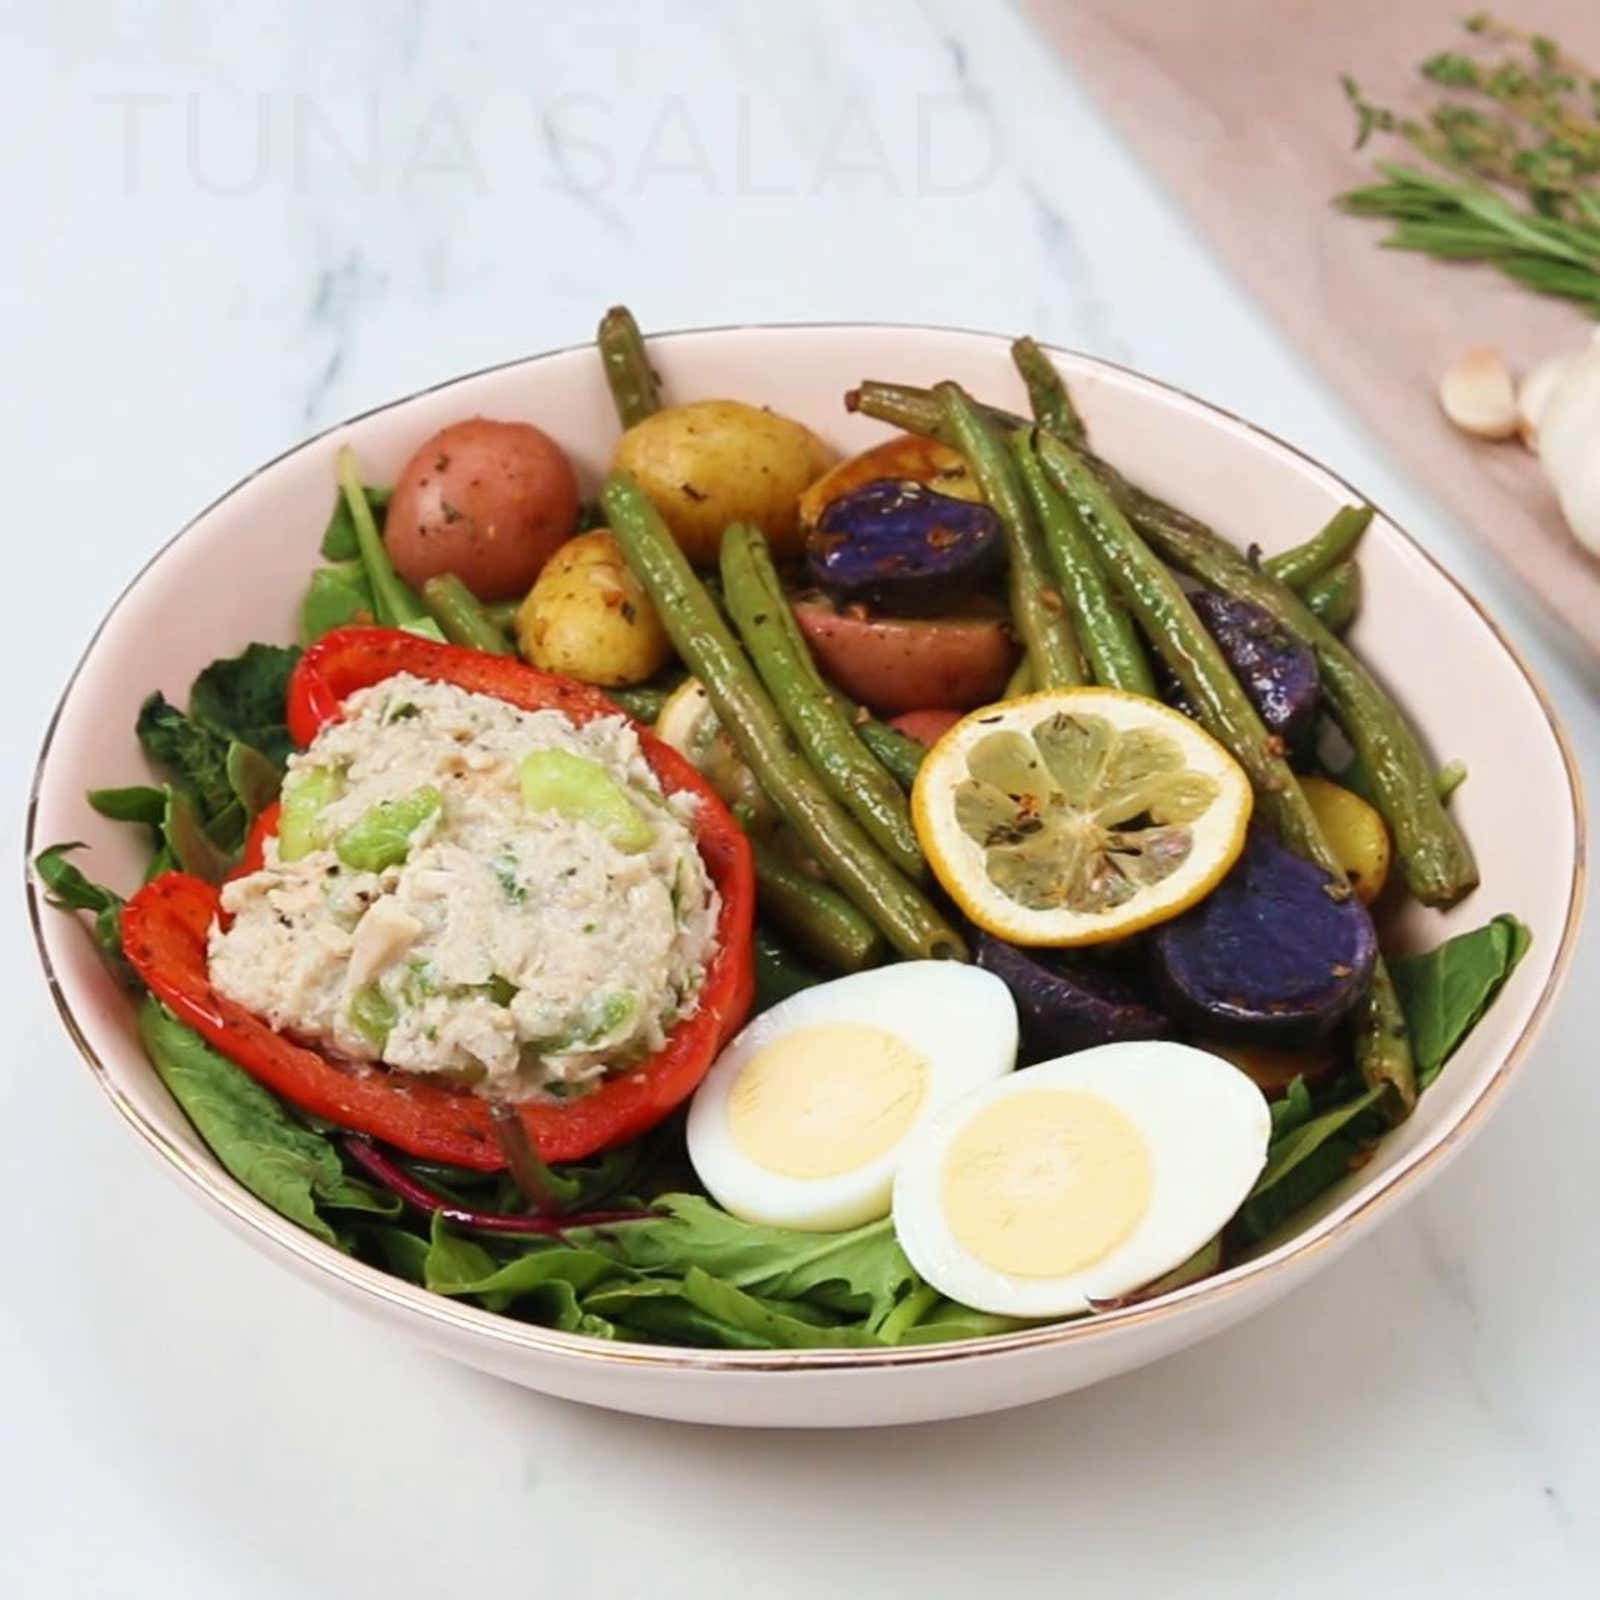 Tuna Salad With Roasted Veggies